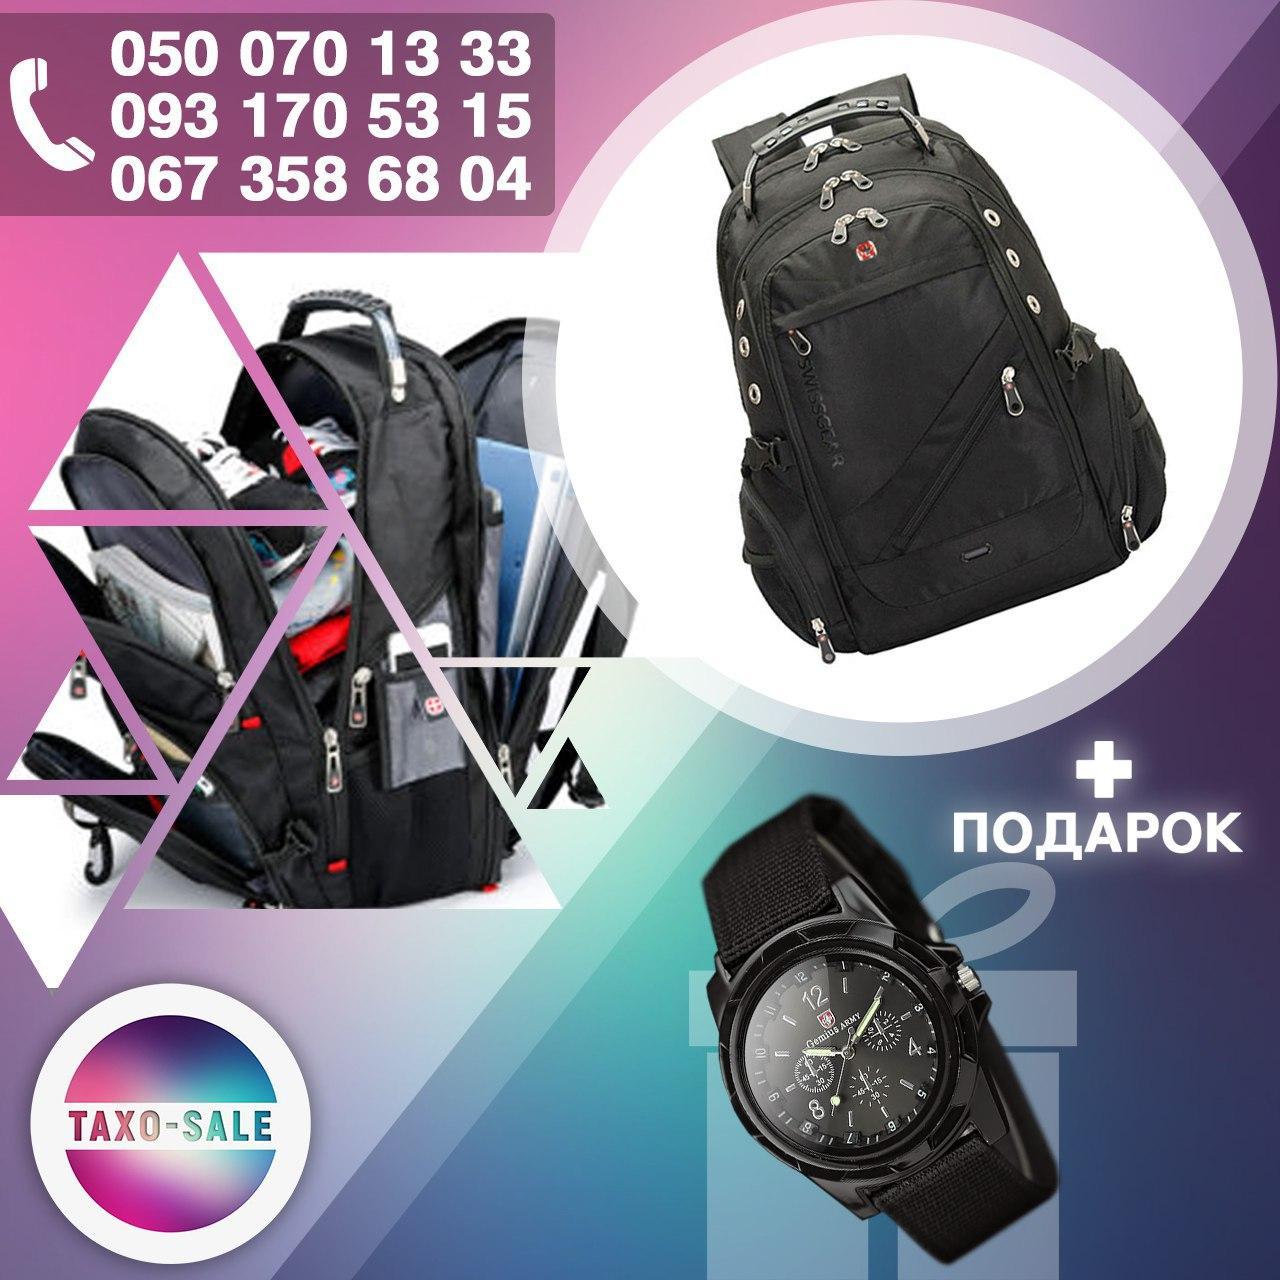 dfd90b30aba9 Швейцарский рюкзак SwissGear Wenger 8810 + Часы Swiss Army + дождевик -  Интернет магазин